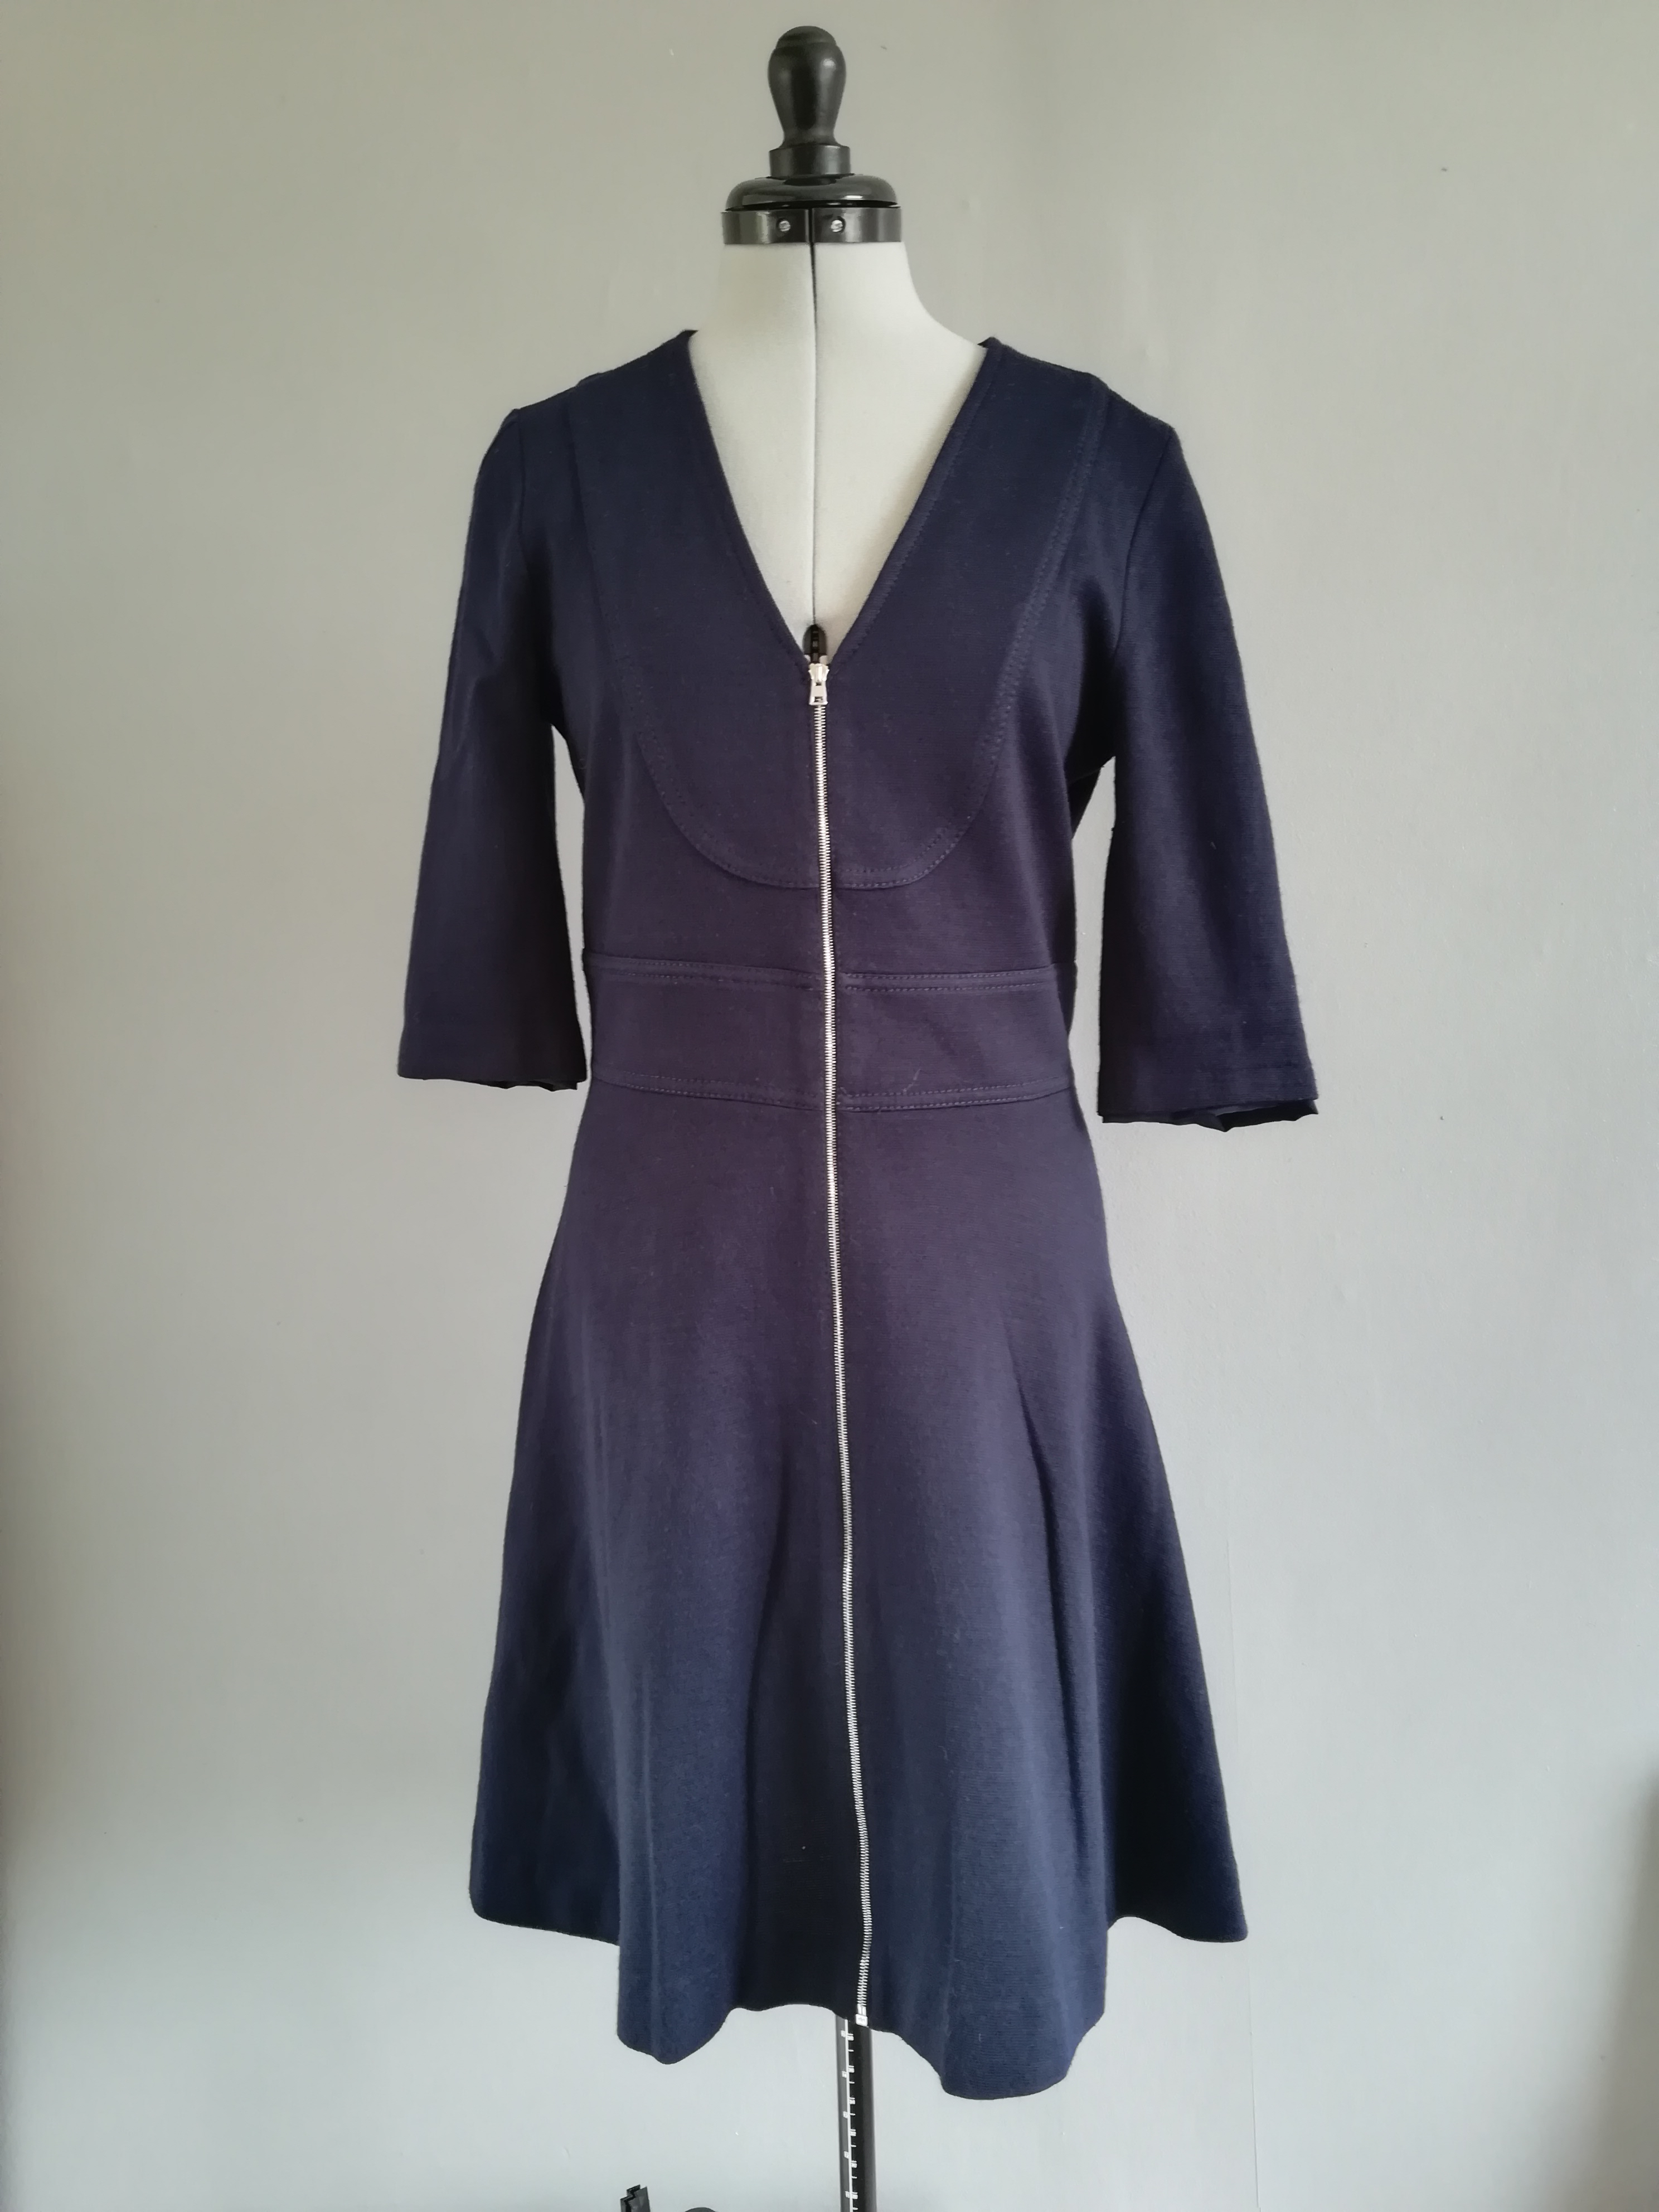 La Bouti'c Taille Robe 40 Pierlot Claudie WqwxWnS1